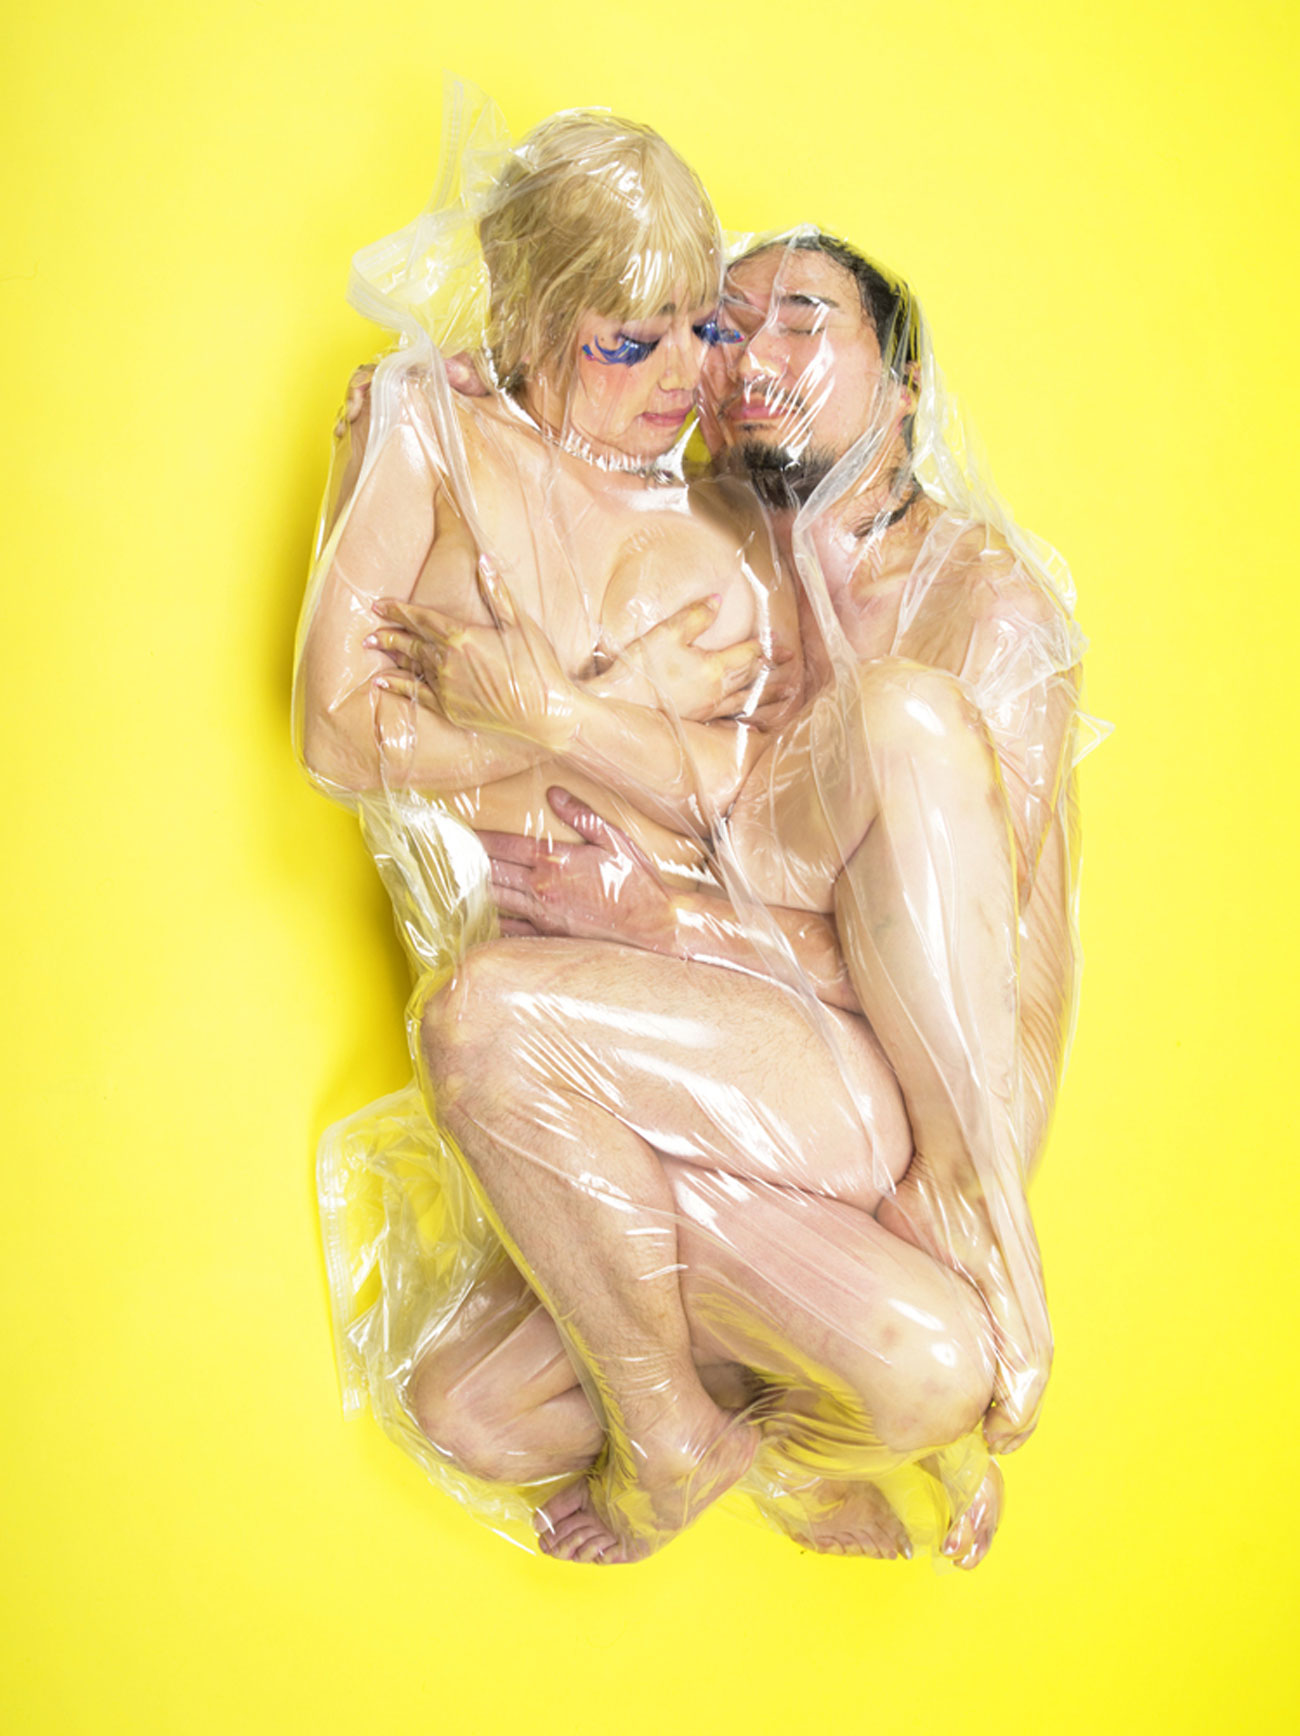 haruhiko-kawaguchi-vacuum-seals-couples-in-plastic-bags